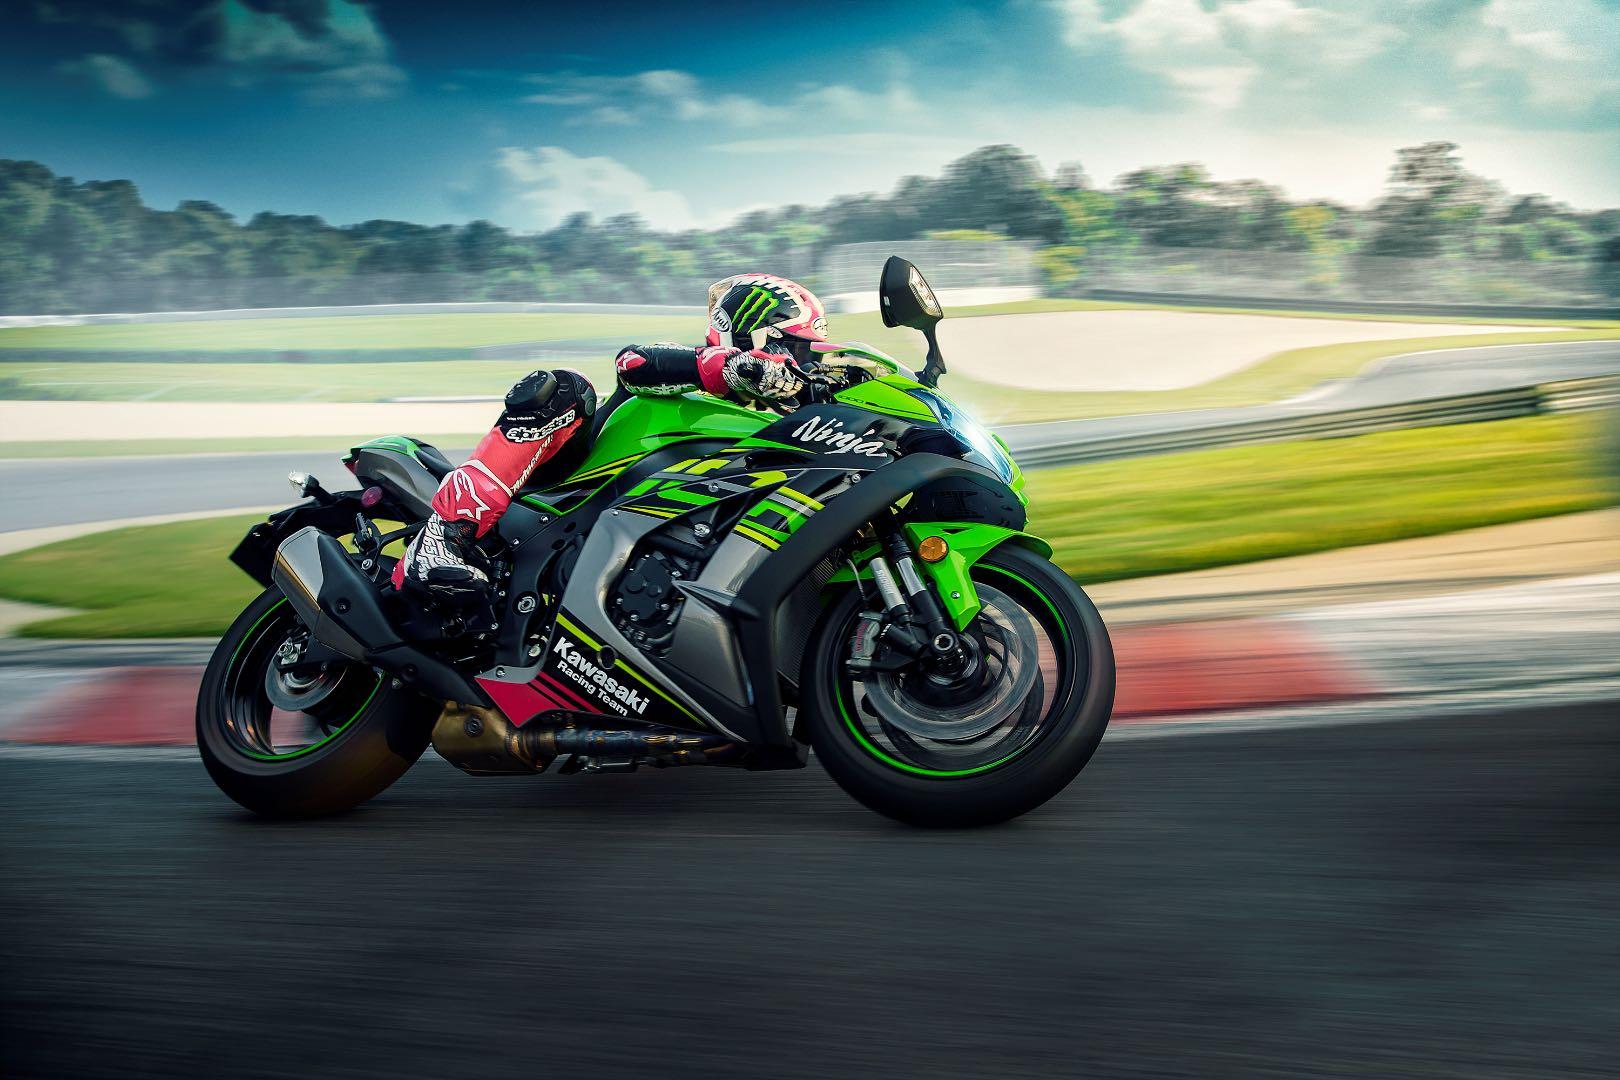 2019 Kawasaki Ninja Zx 10r And Zx 10rr Updates First Look